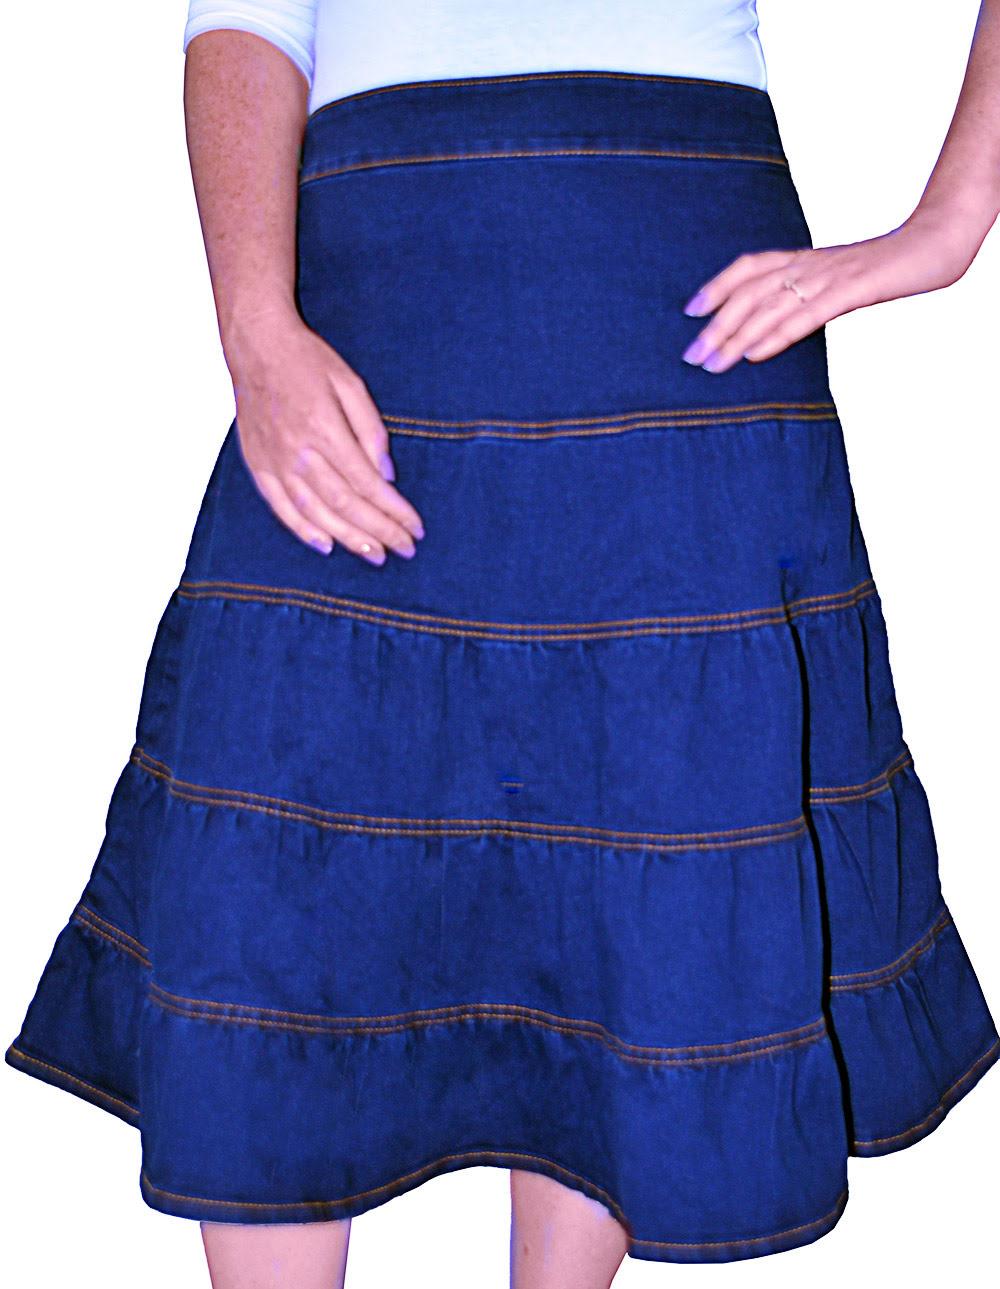 Women's knee length denim skirts. Kosher Casual